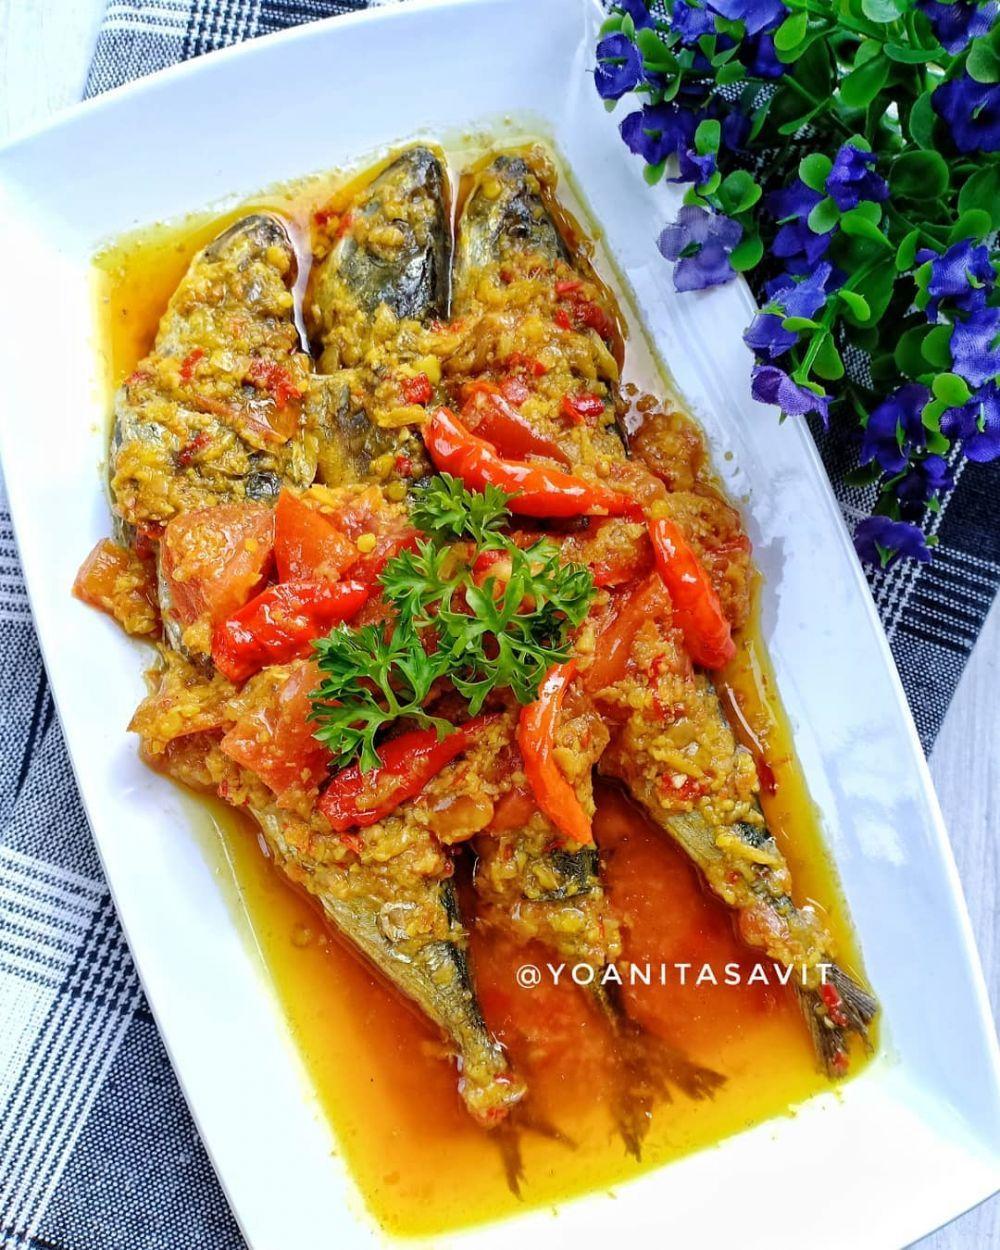 Resep Pesmol Ikan C 2020 Brilio Net Di 2020 Resep Masakan Masakan Makanan Mudah